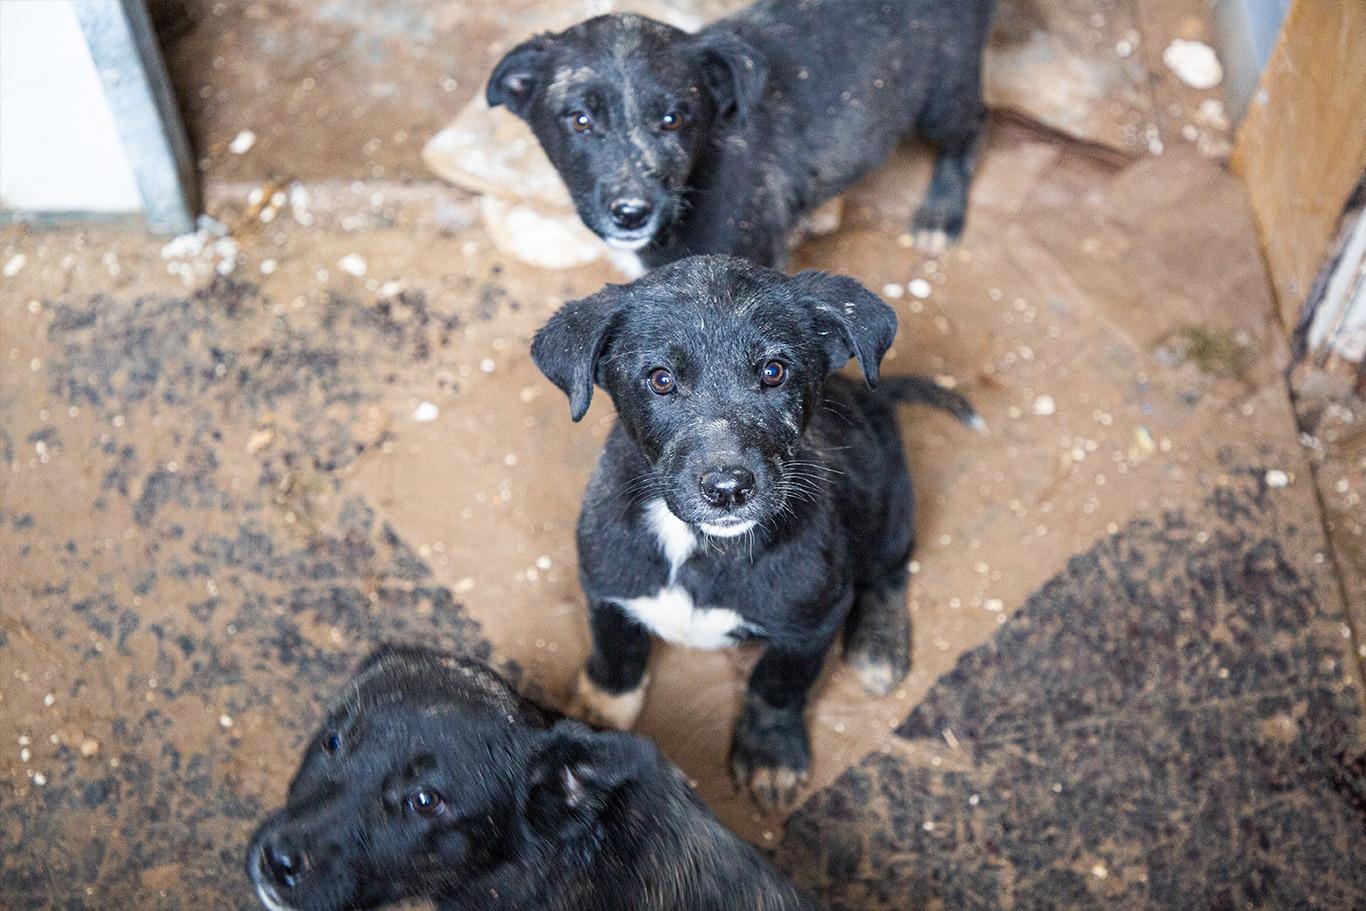 Cassandra and her six defenseless puppies DESPERATELY need help! 3